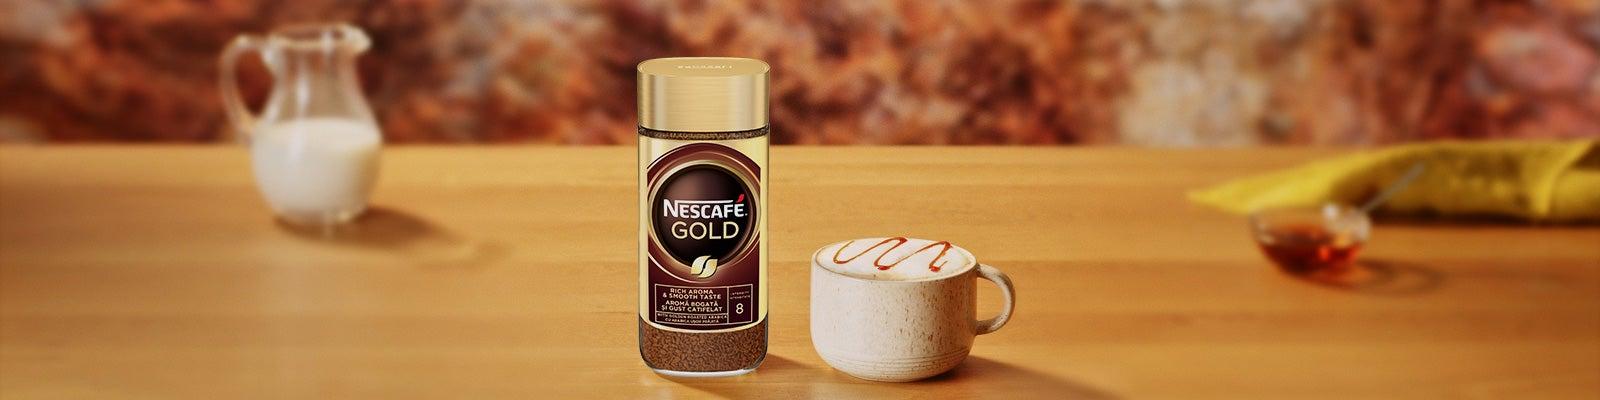 Creamy-Caramel-Latte